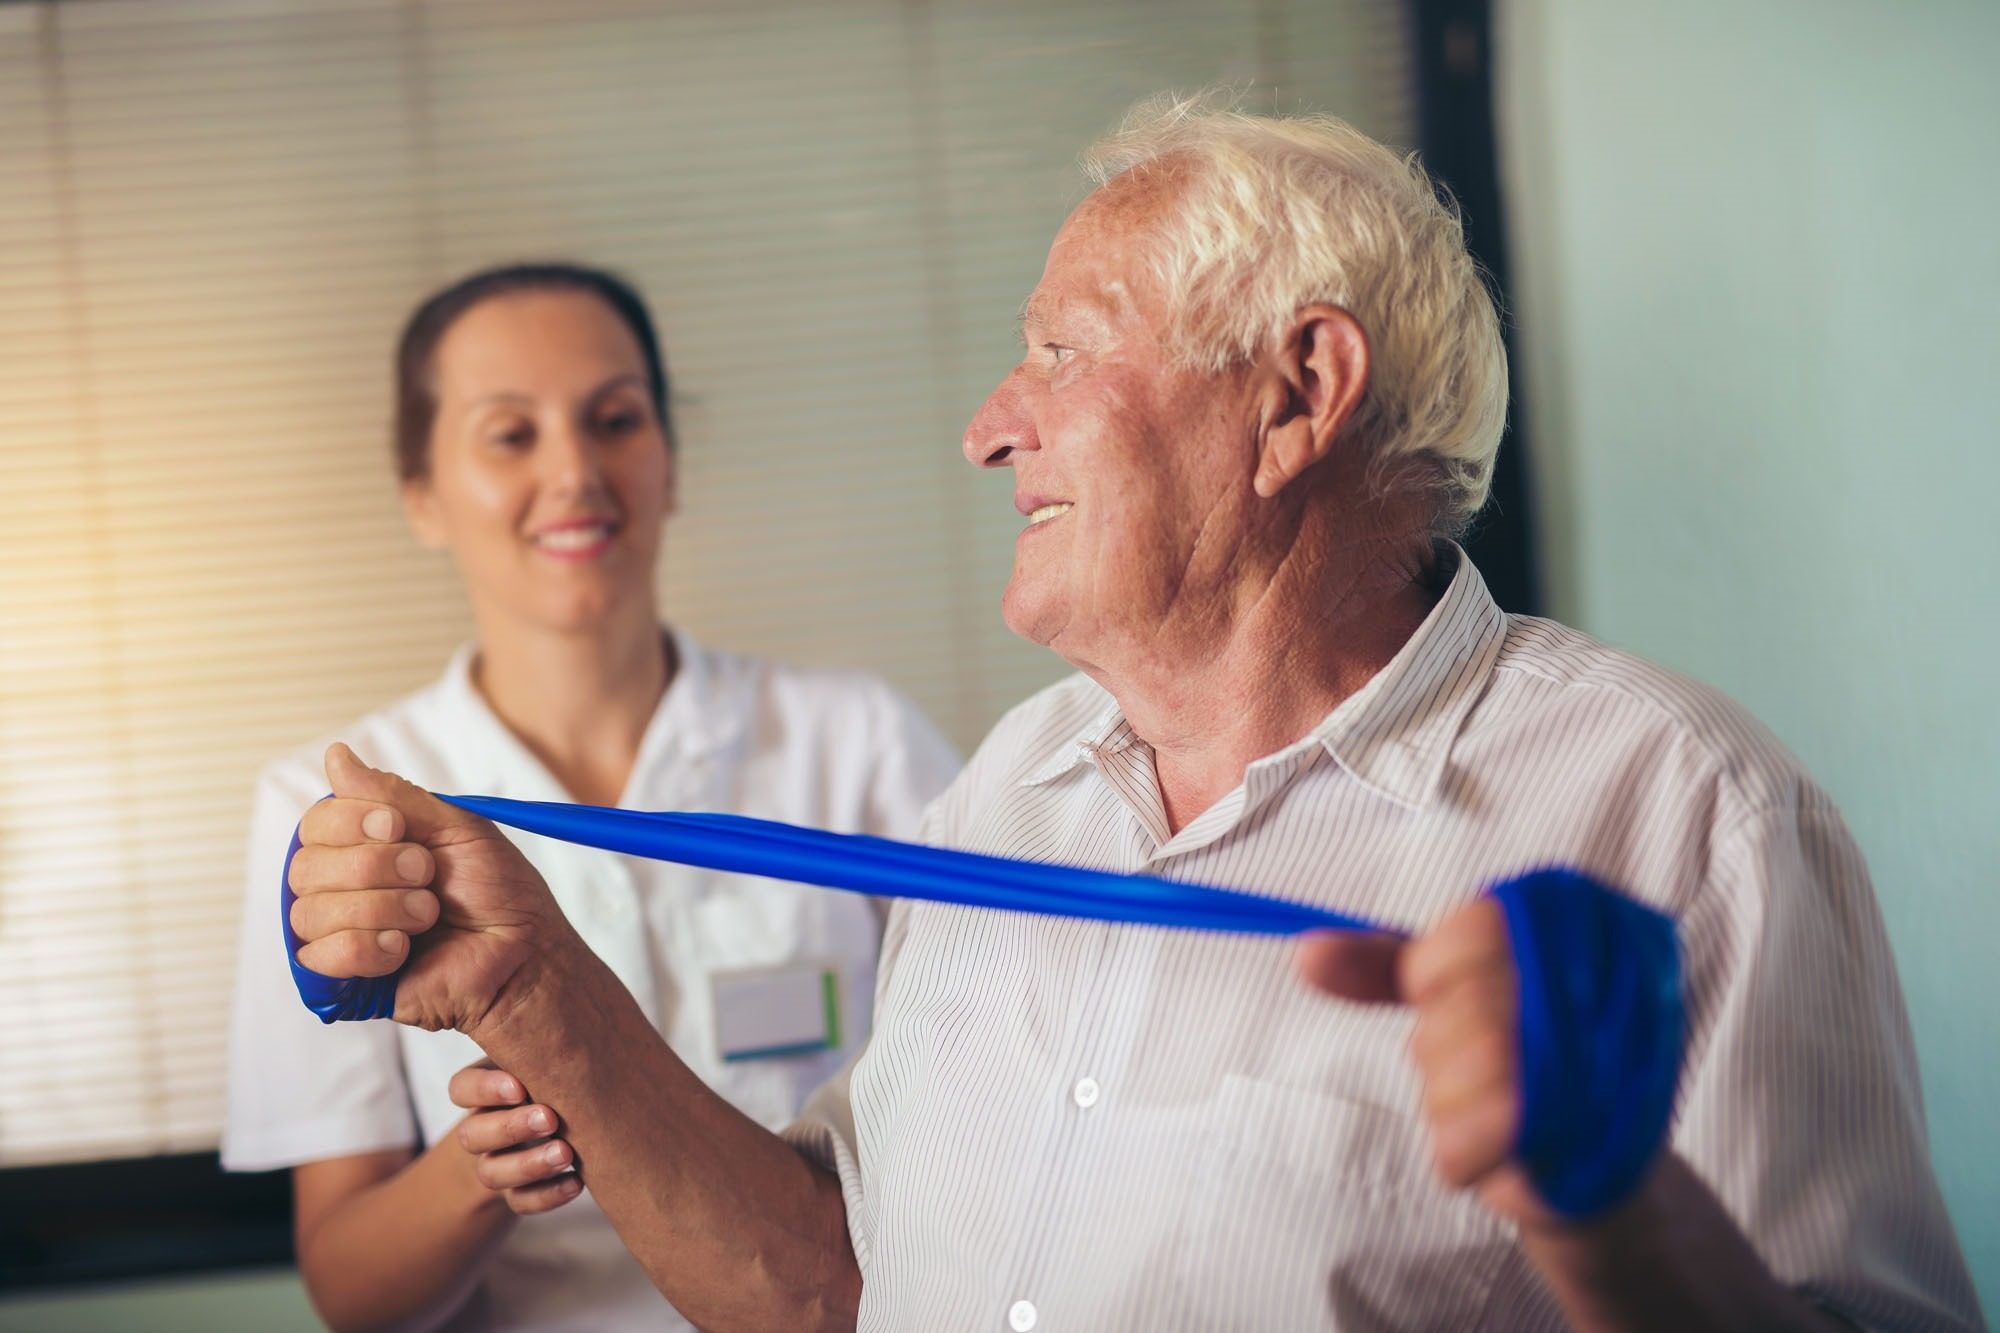 Terapia ocupacional: importância e diferença da terapia comum